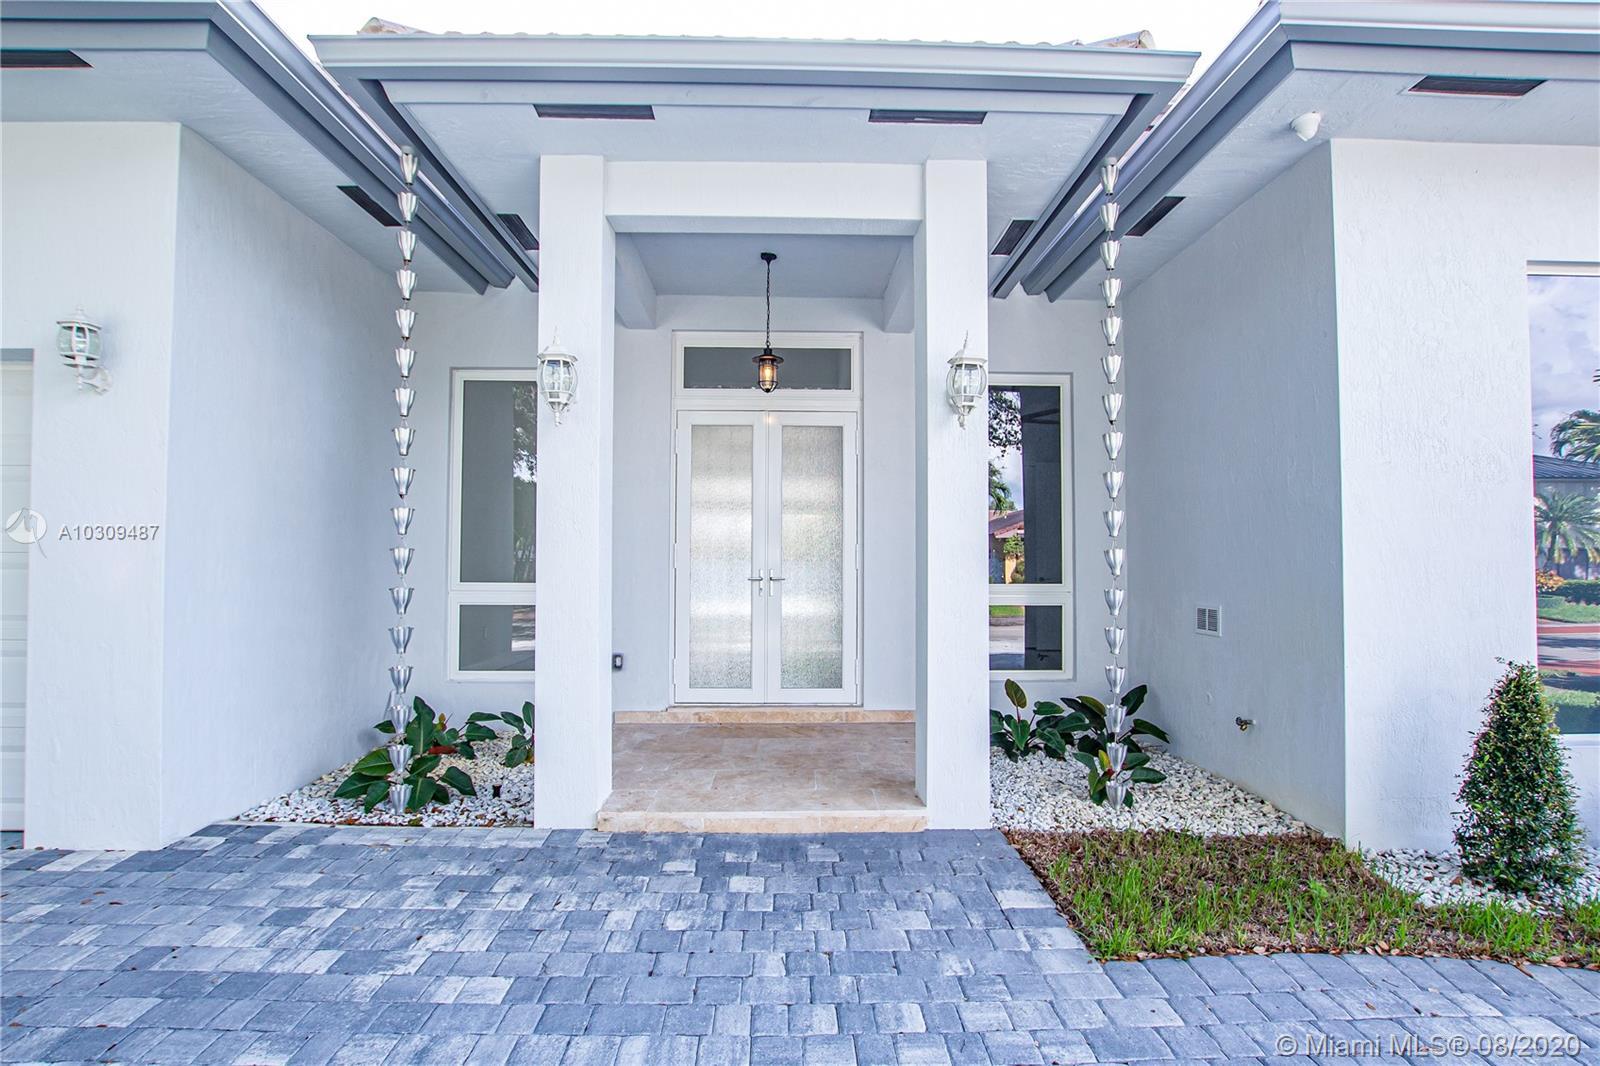 16907 NW 83rd Pl, Hialeah Gardens, Florida